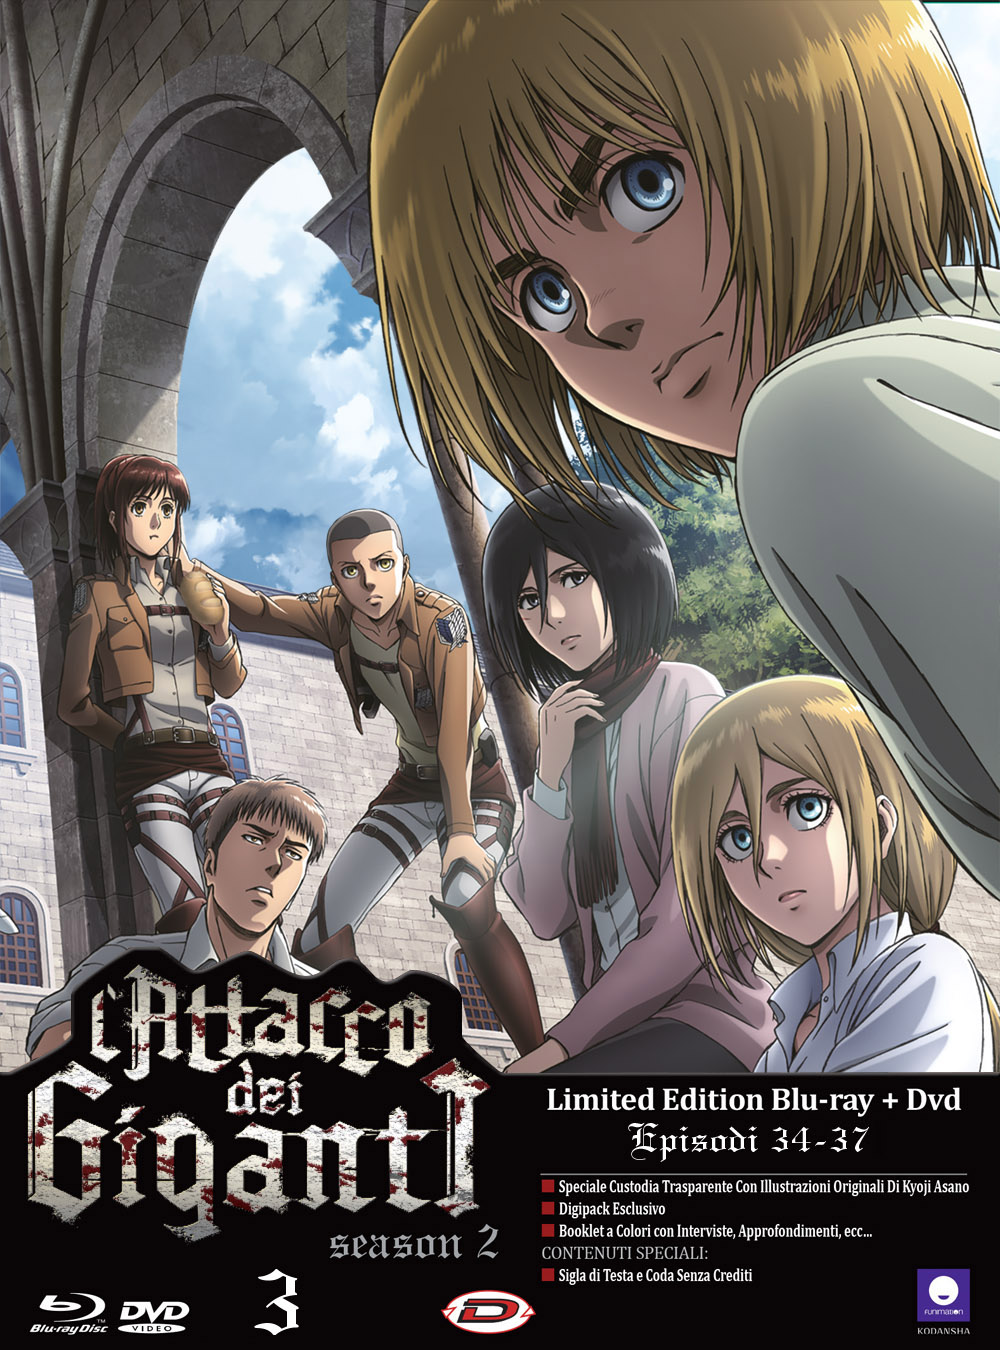 COF.L'ATTACCO DEI GIGANTI - STAGIONE 02 #03 (EPS 09-12) (LDT ED) (BLU-RAY+DVD)